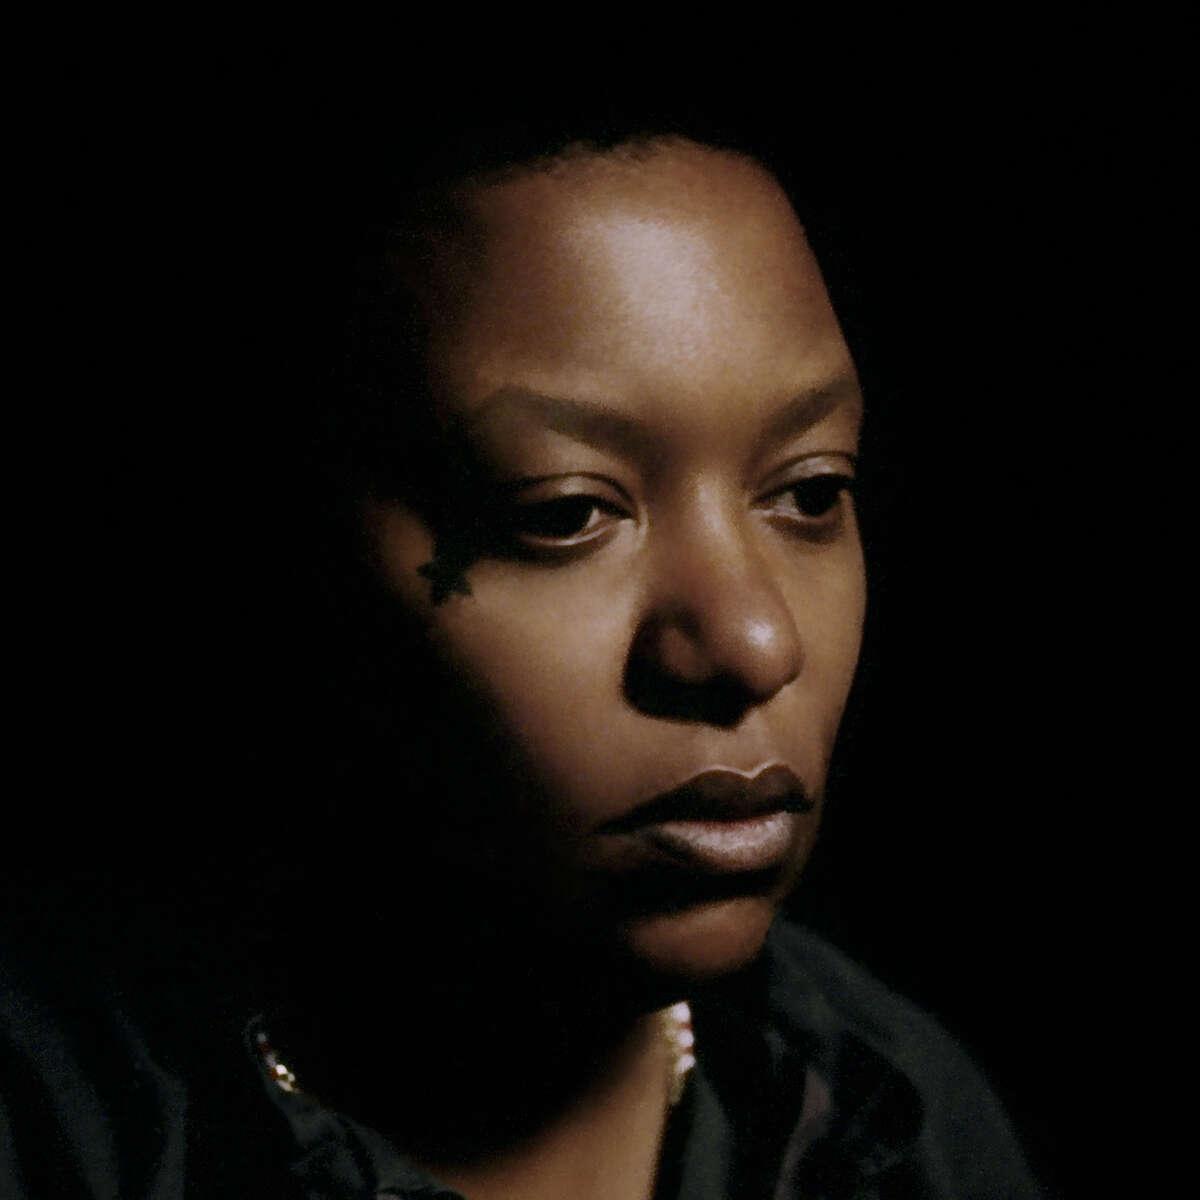 Meshell Ndegeocello's tenth album is Pour Une Ame Souveraine: A Dedication to Nina Simone. (Courtesy of the artist)